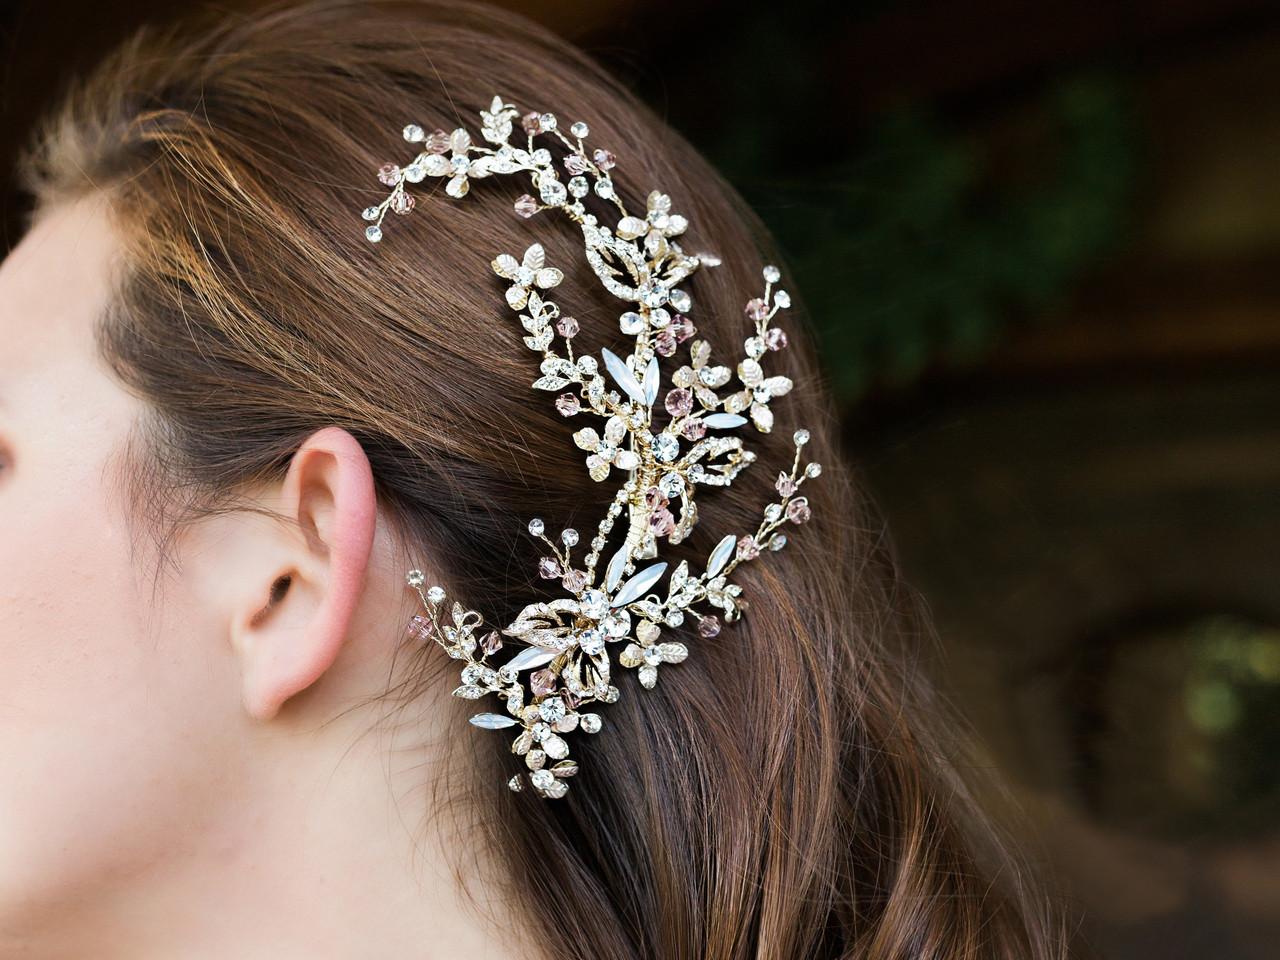 En Vogue Bridal Comb HC1932 - Rhinestone and crystal accents